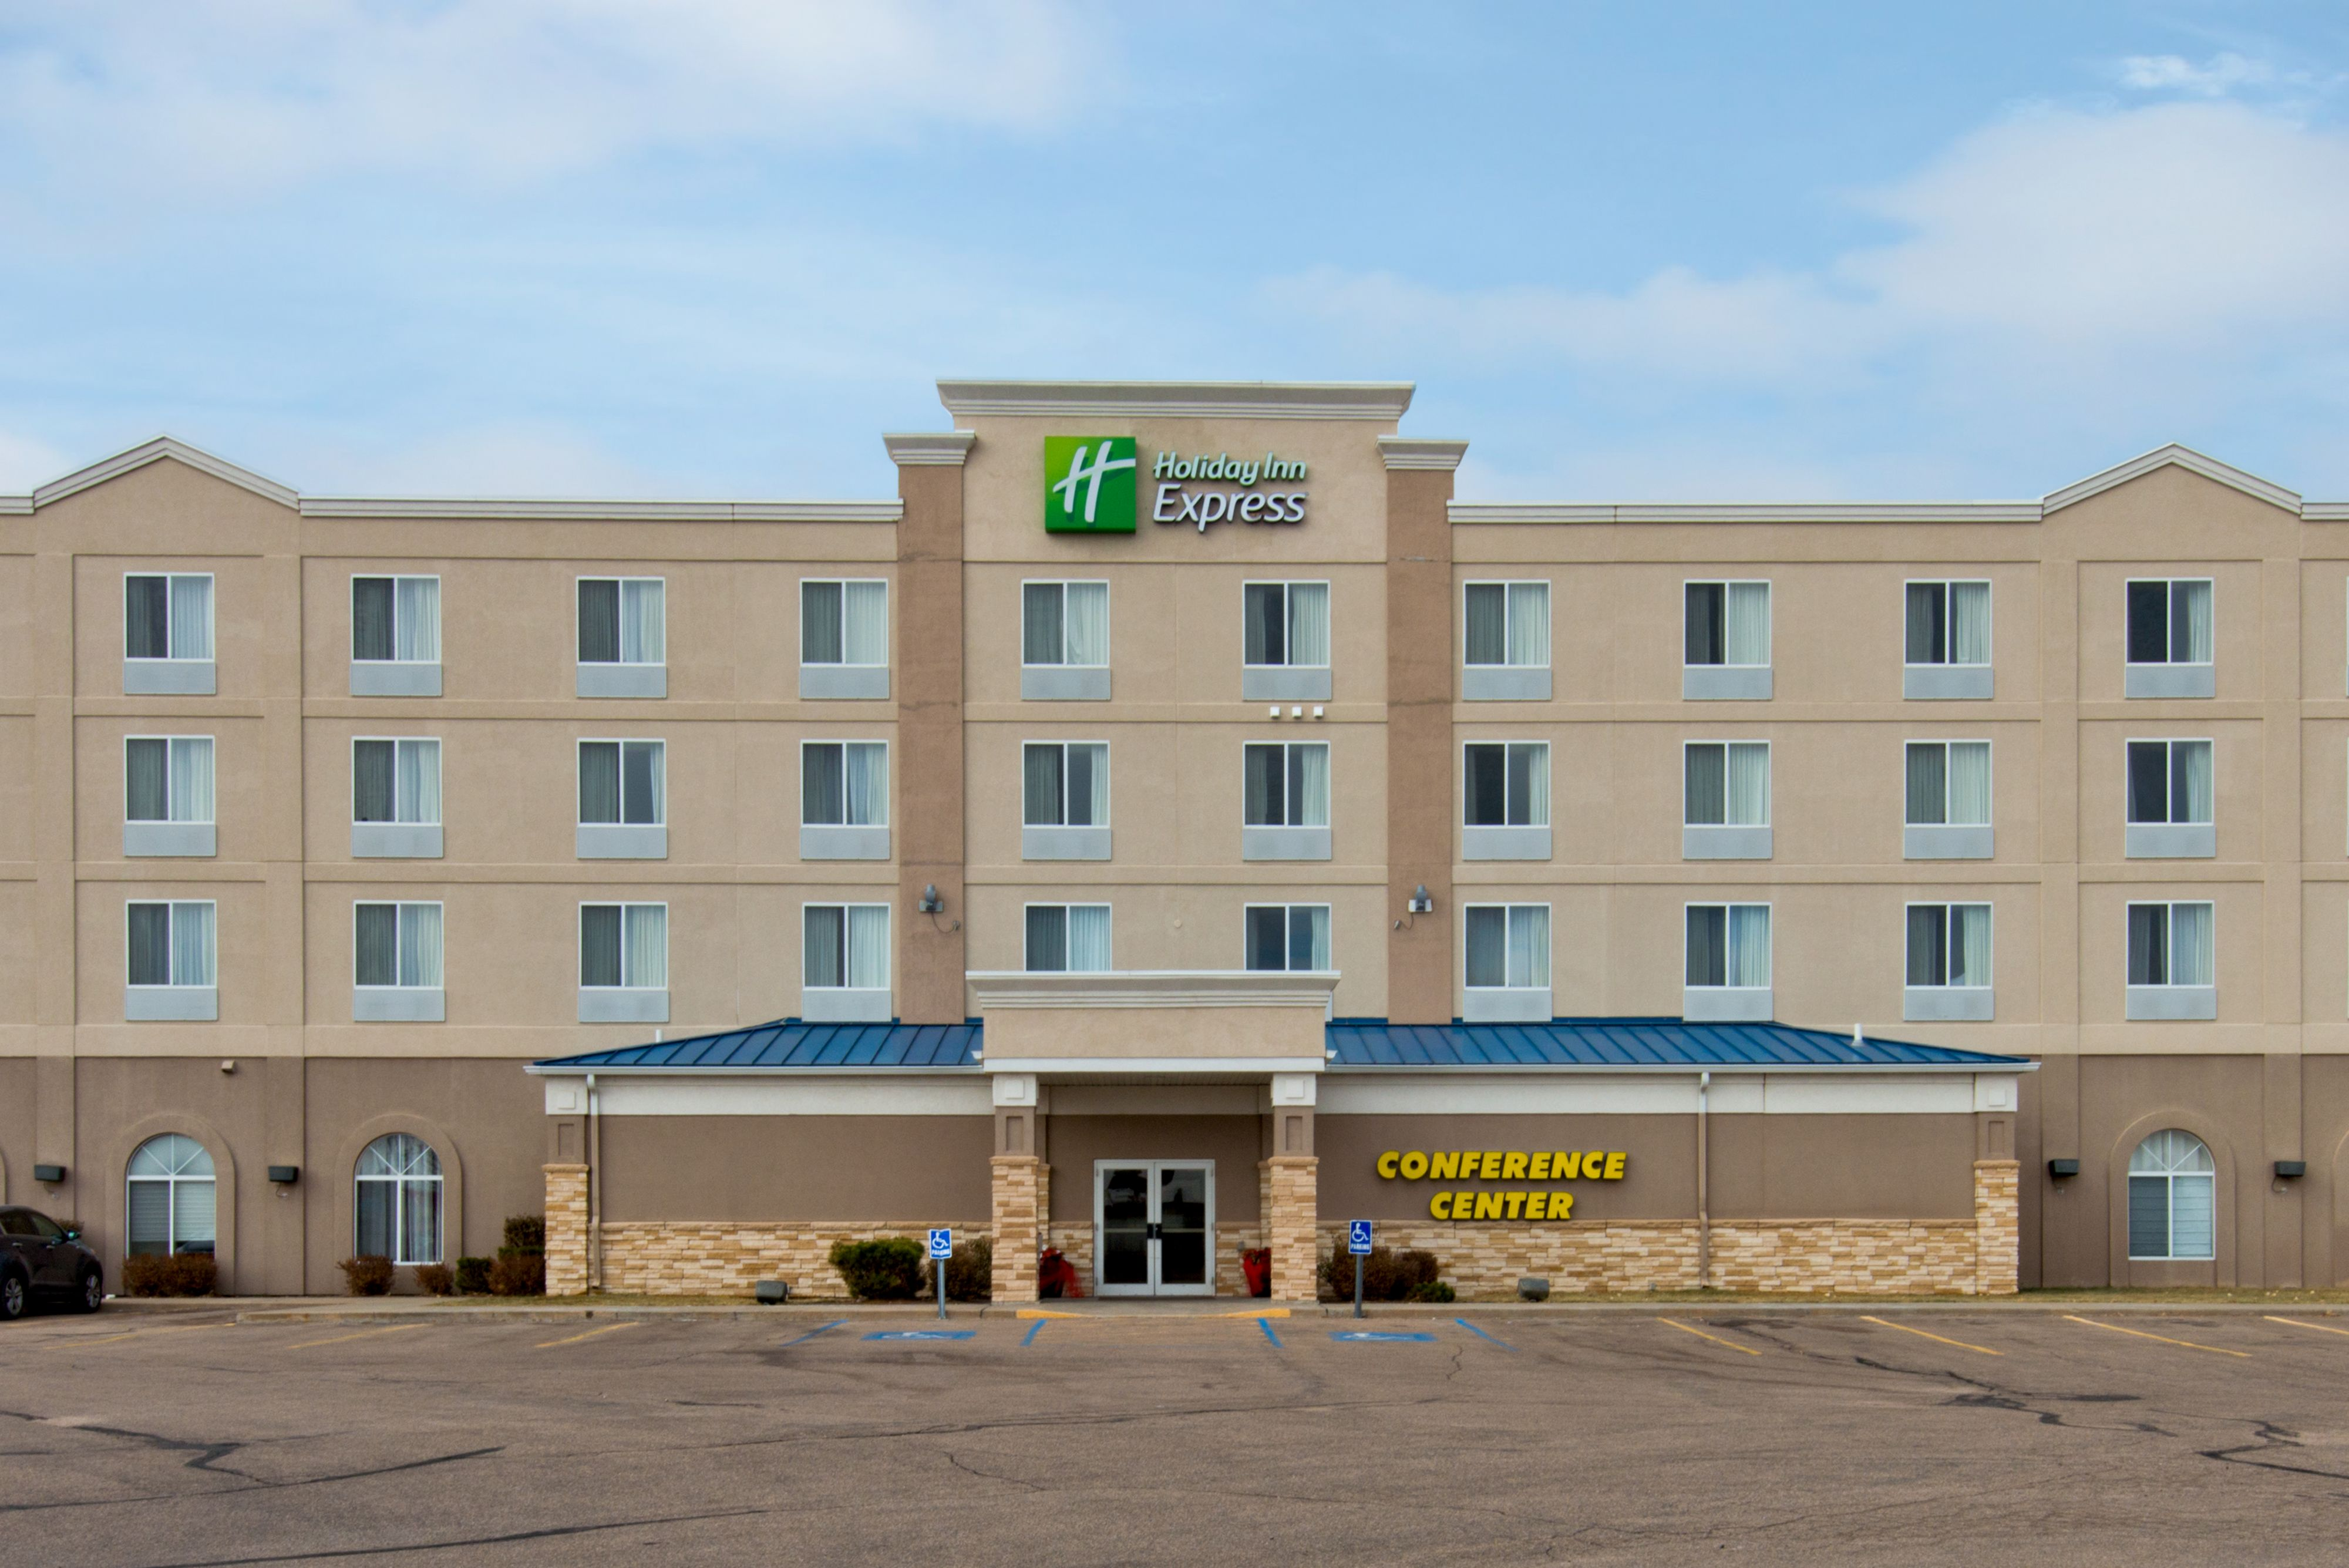 Holiday Inn Express Suites North Little Rock North Little Rock Arkansas Ar